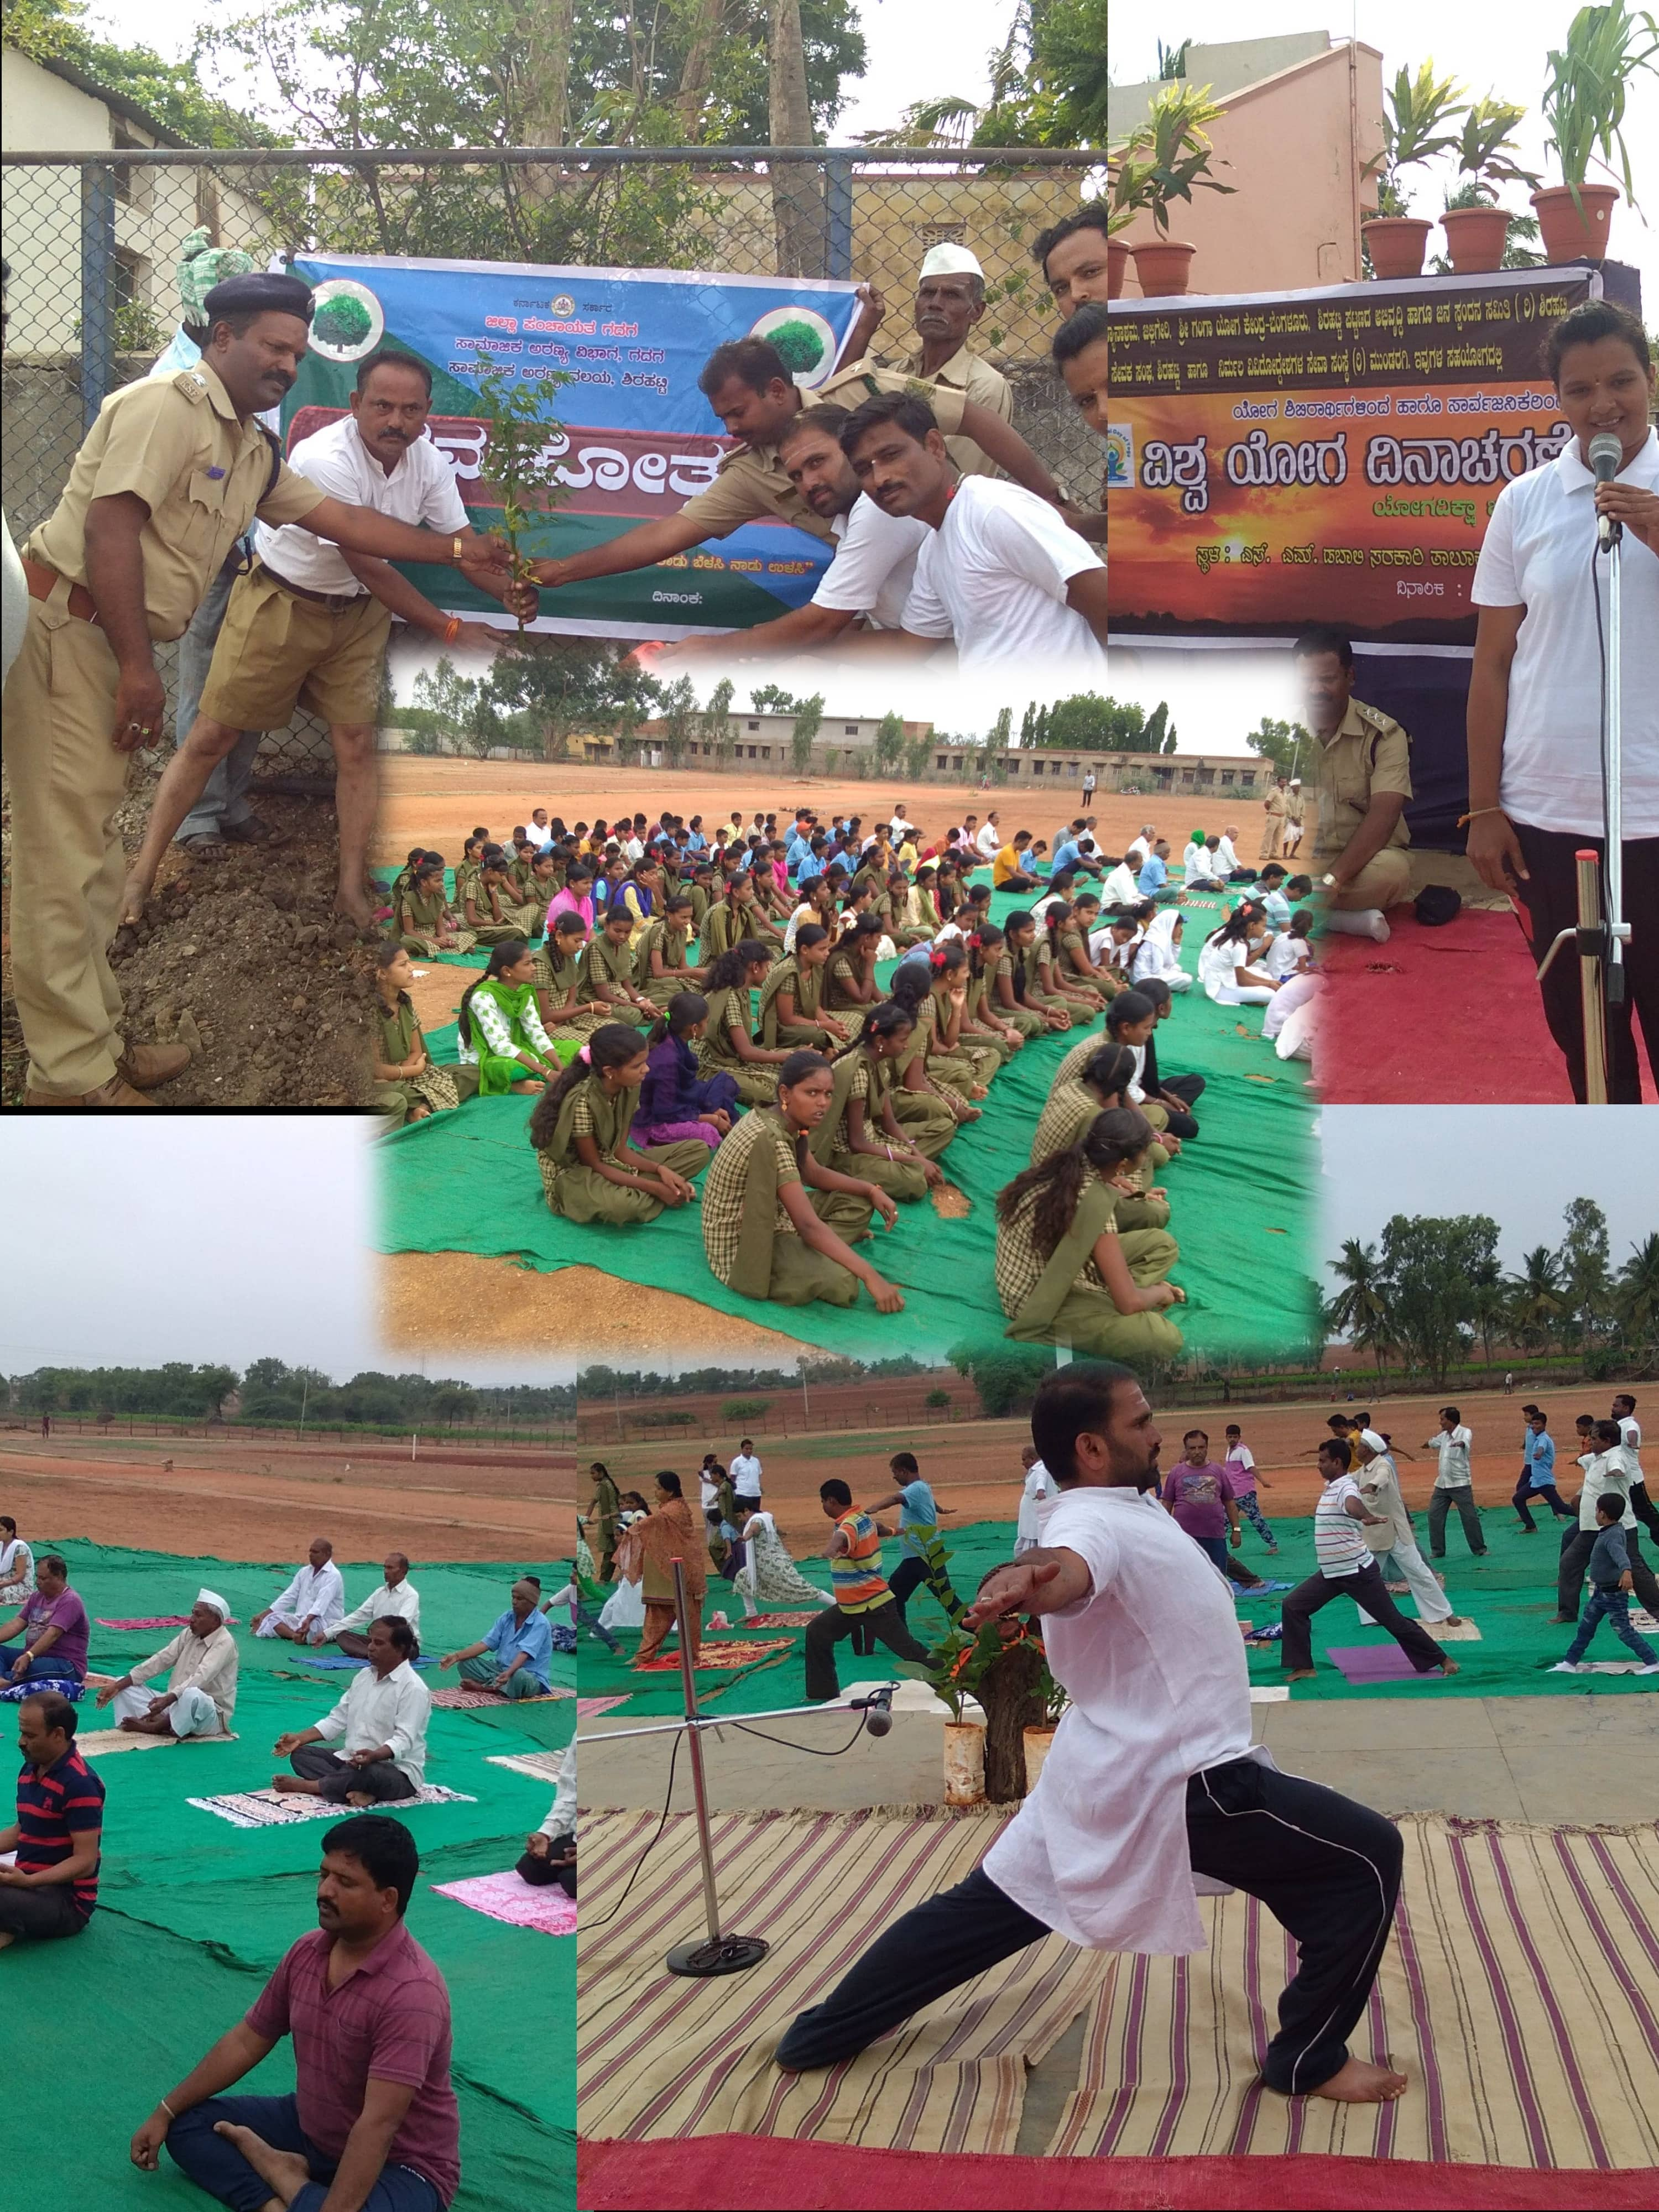 /media/nirmalavss/1NGO-00290-Nirmala_Vivedodeshagala_Seva_Samsthe-Activities-World_Yoga_Day-min.jpg